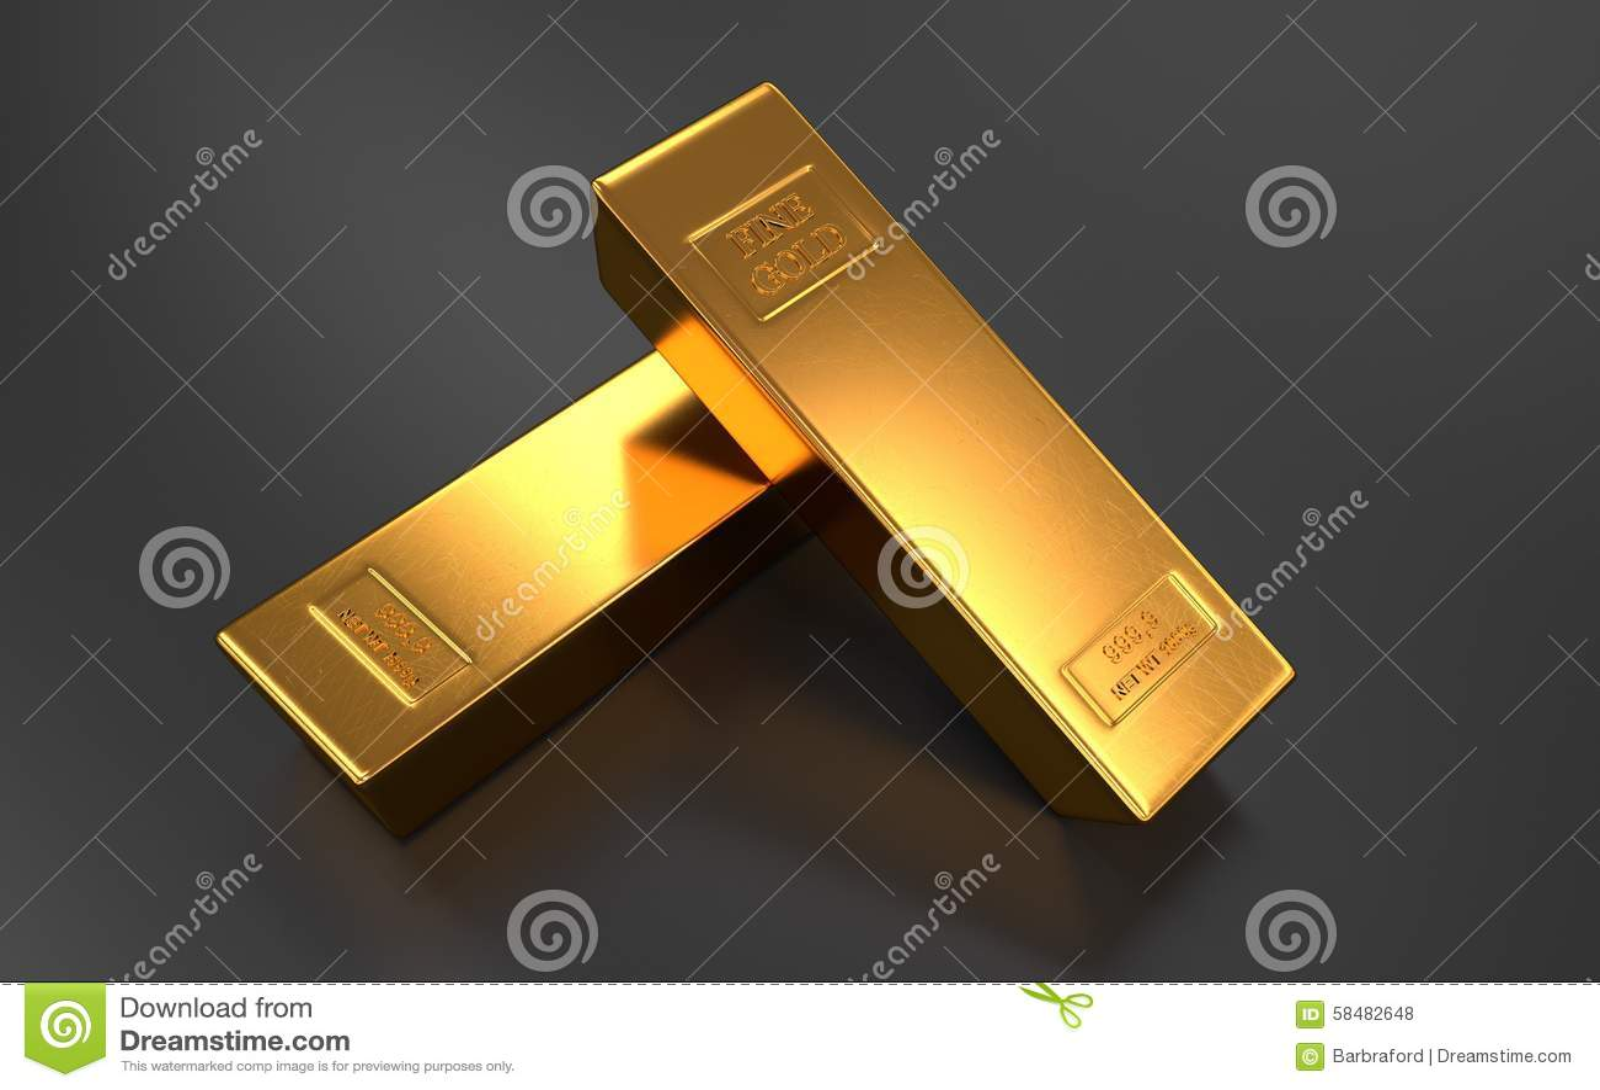 gold bar black background - photo #22